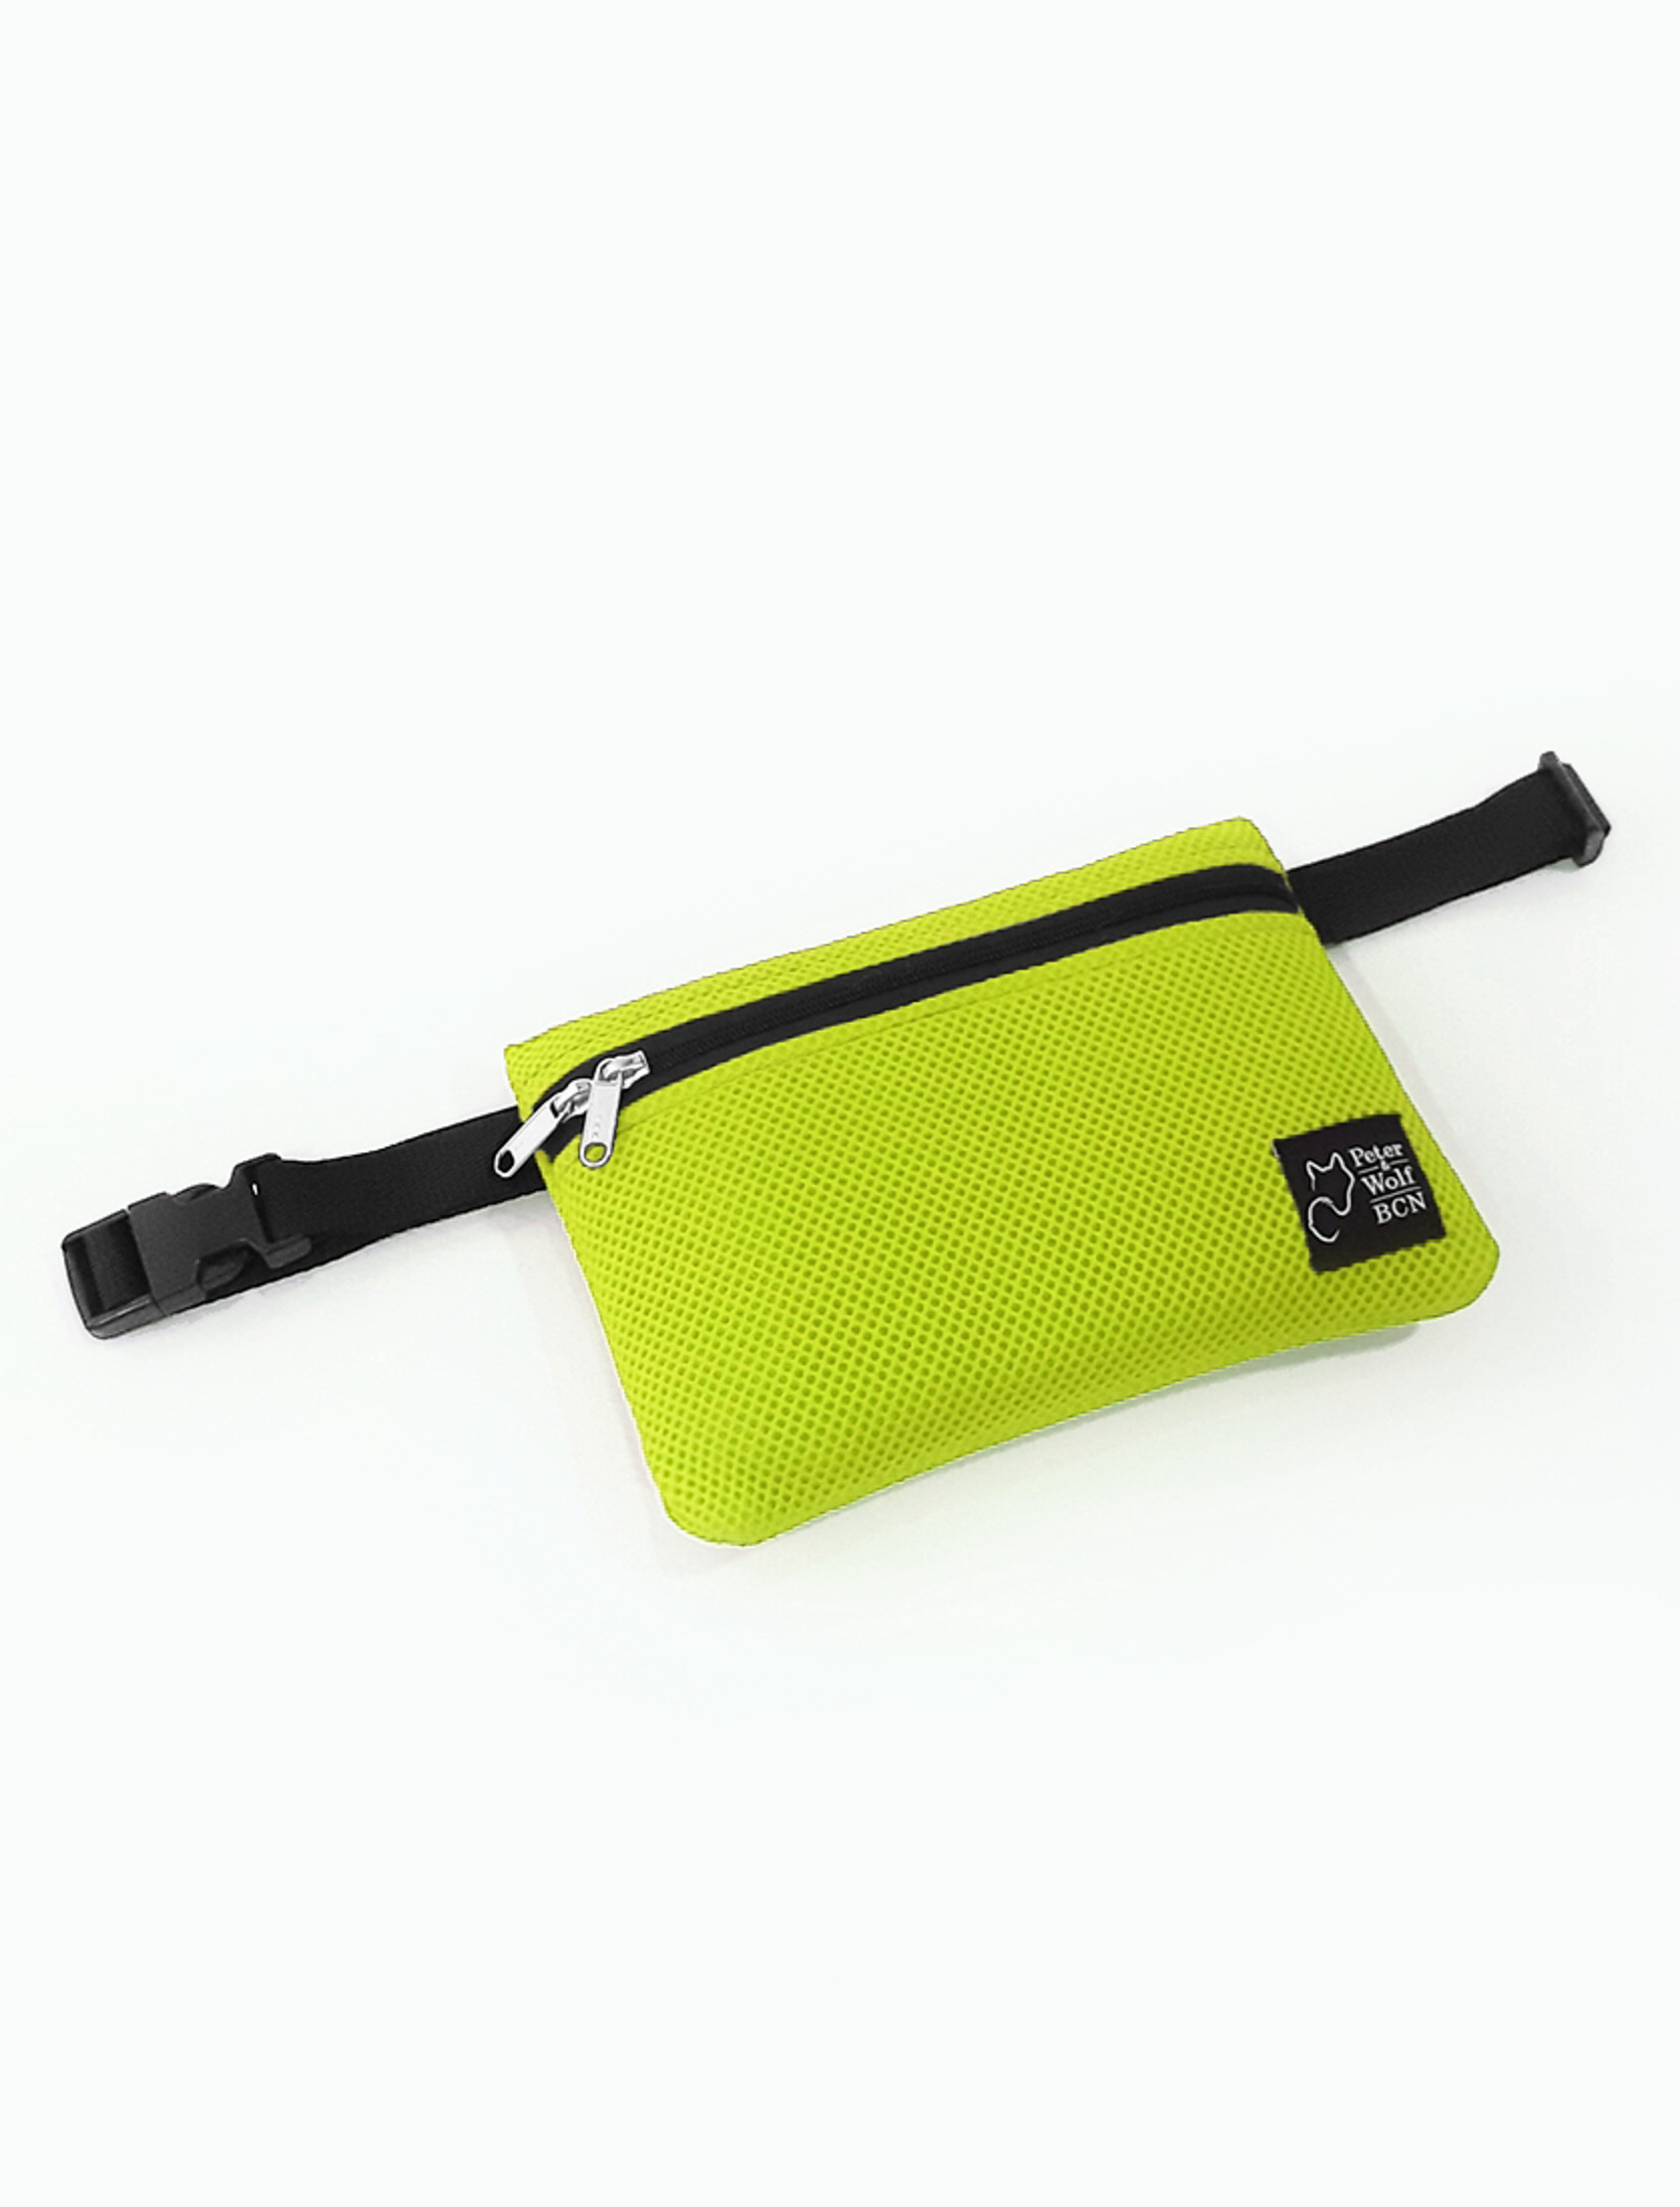 Riñonera en tejido técnico 3D con bolsillo interior con cremallera confeccionada a mano color verde lima. Interior color negro